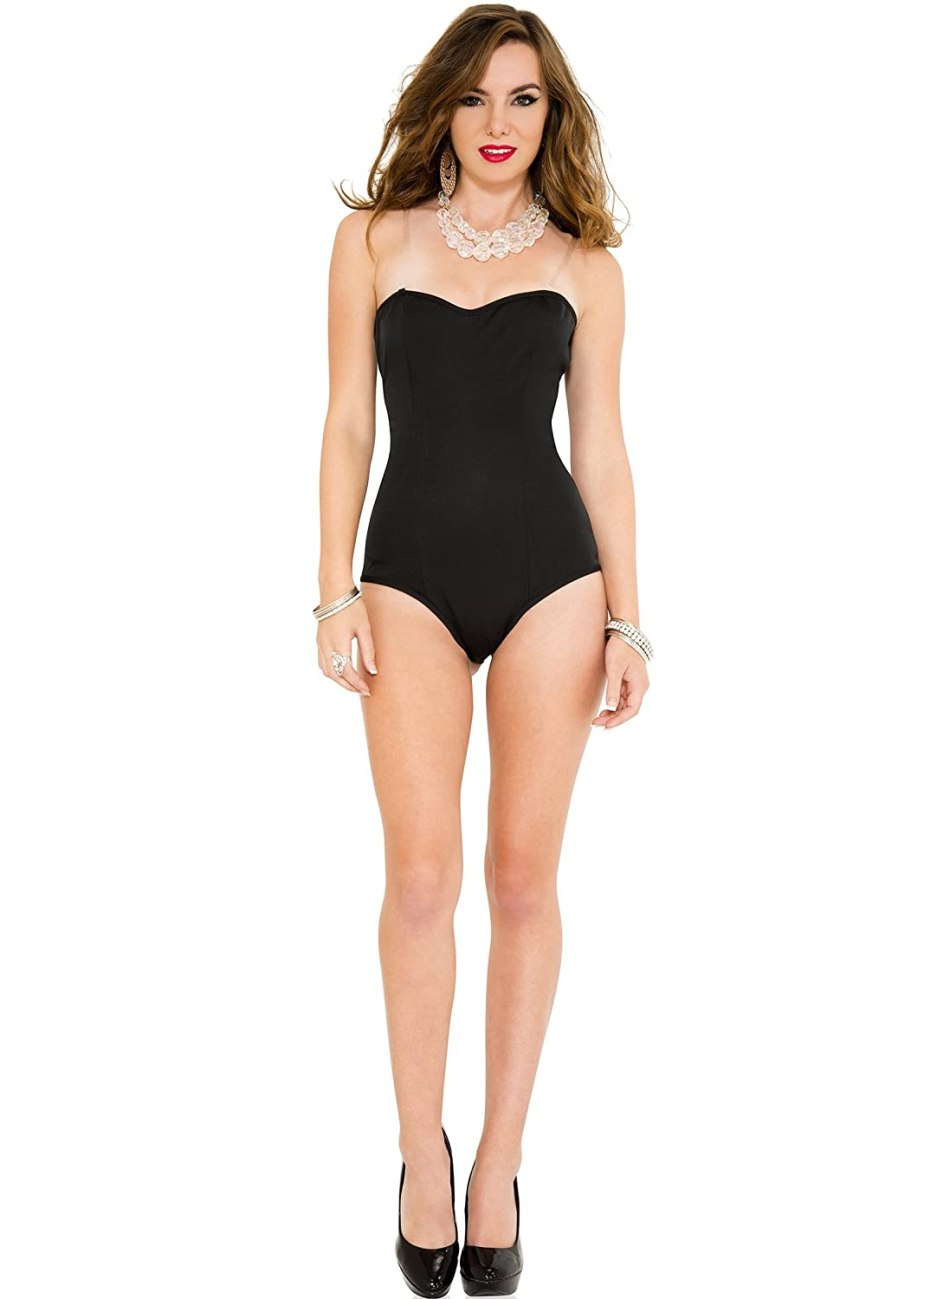 how to make a black swan costume - Women's Strapless Bodysuit